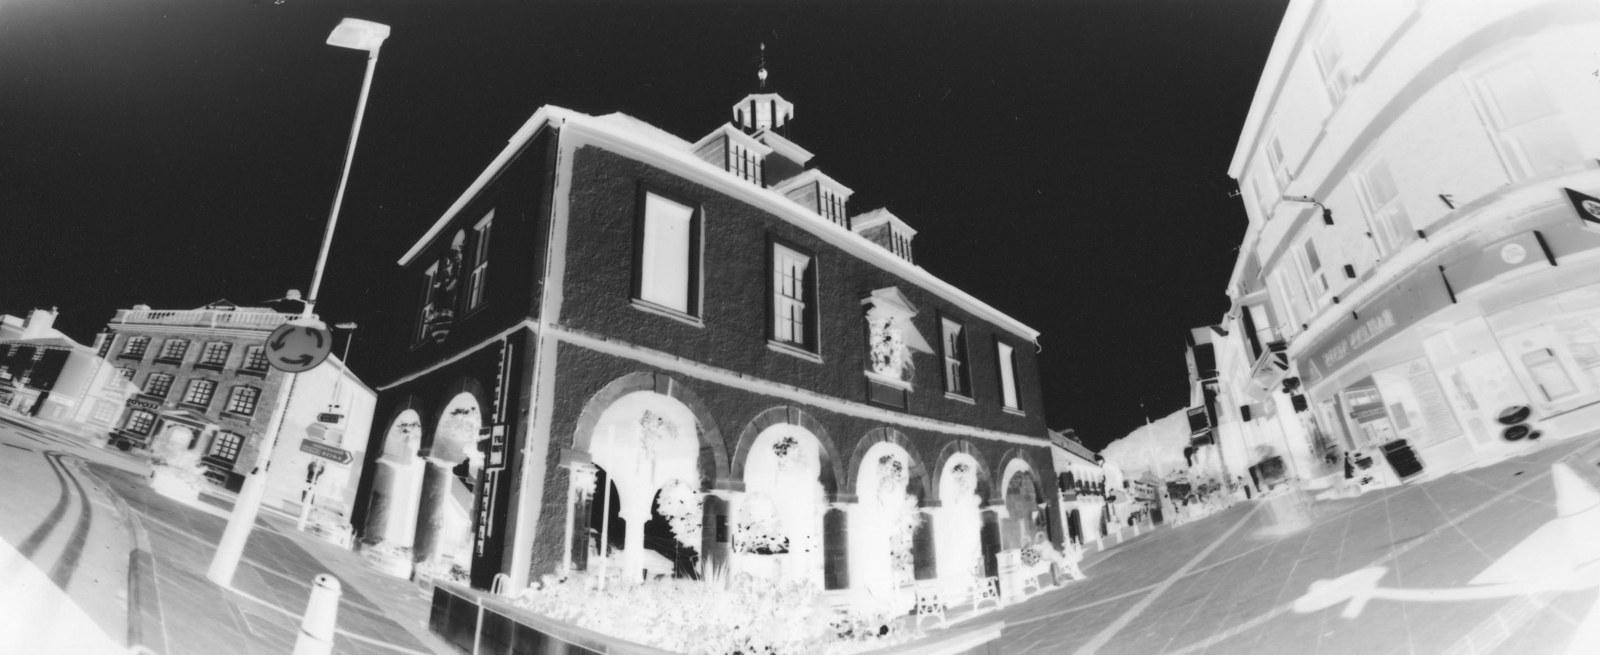 1. Market Hall